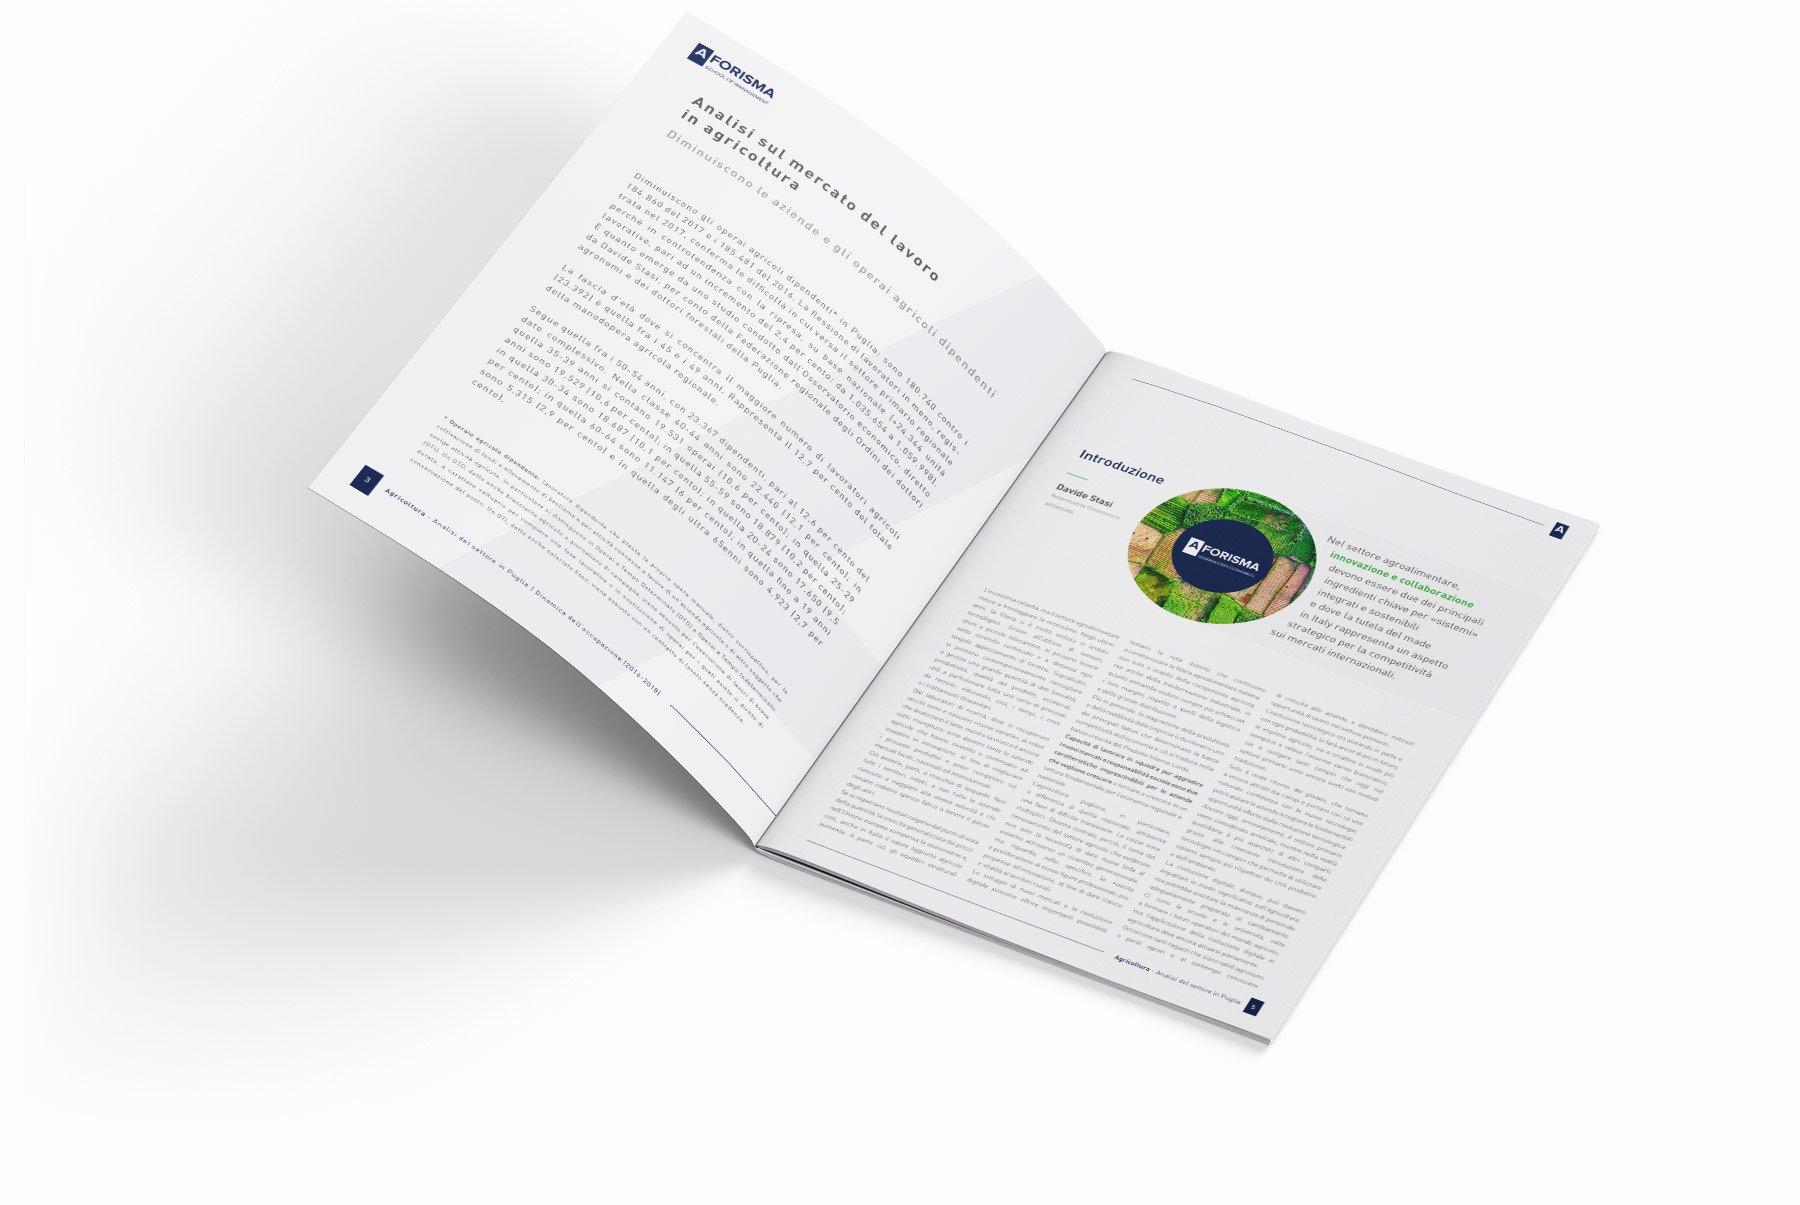 BriefMe_AFORISMA_img_brochure_oss_interno3